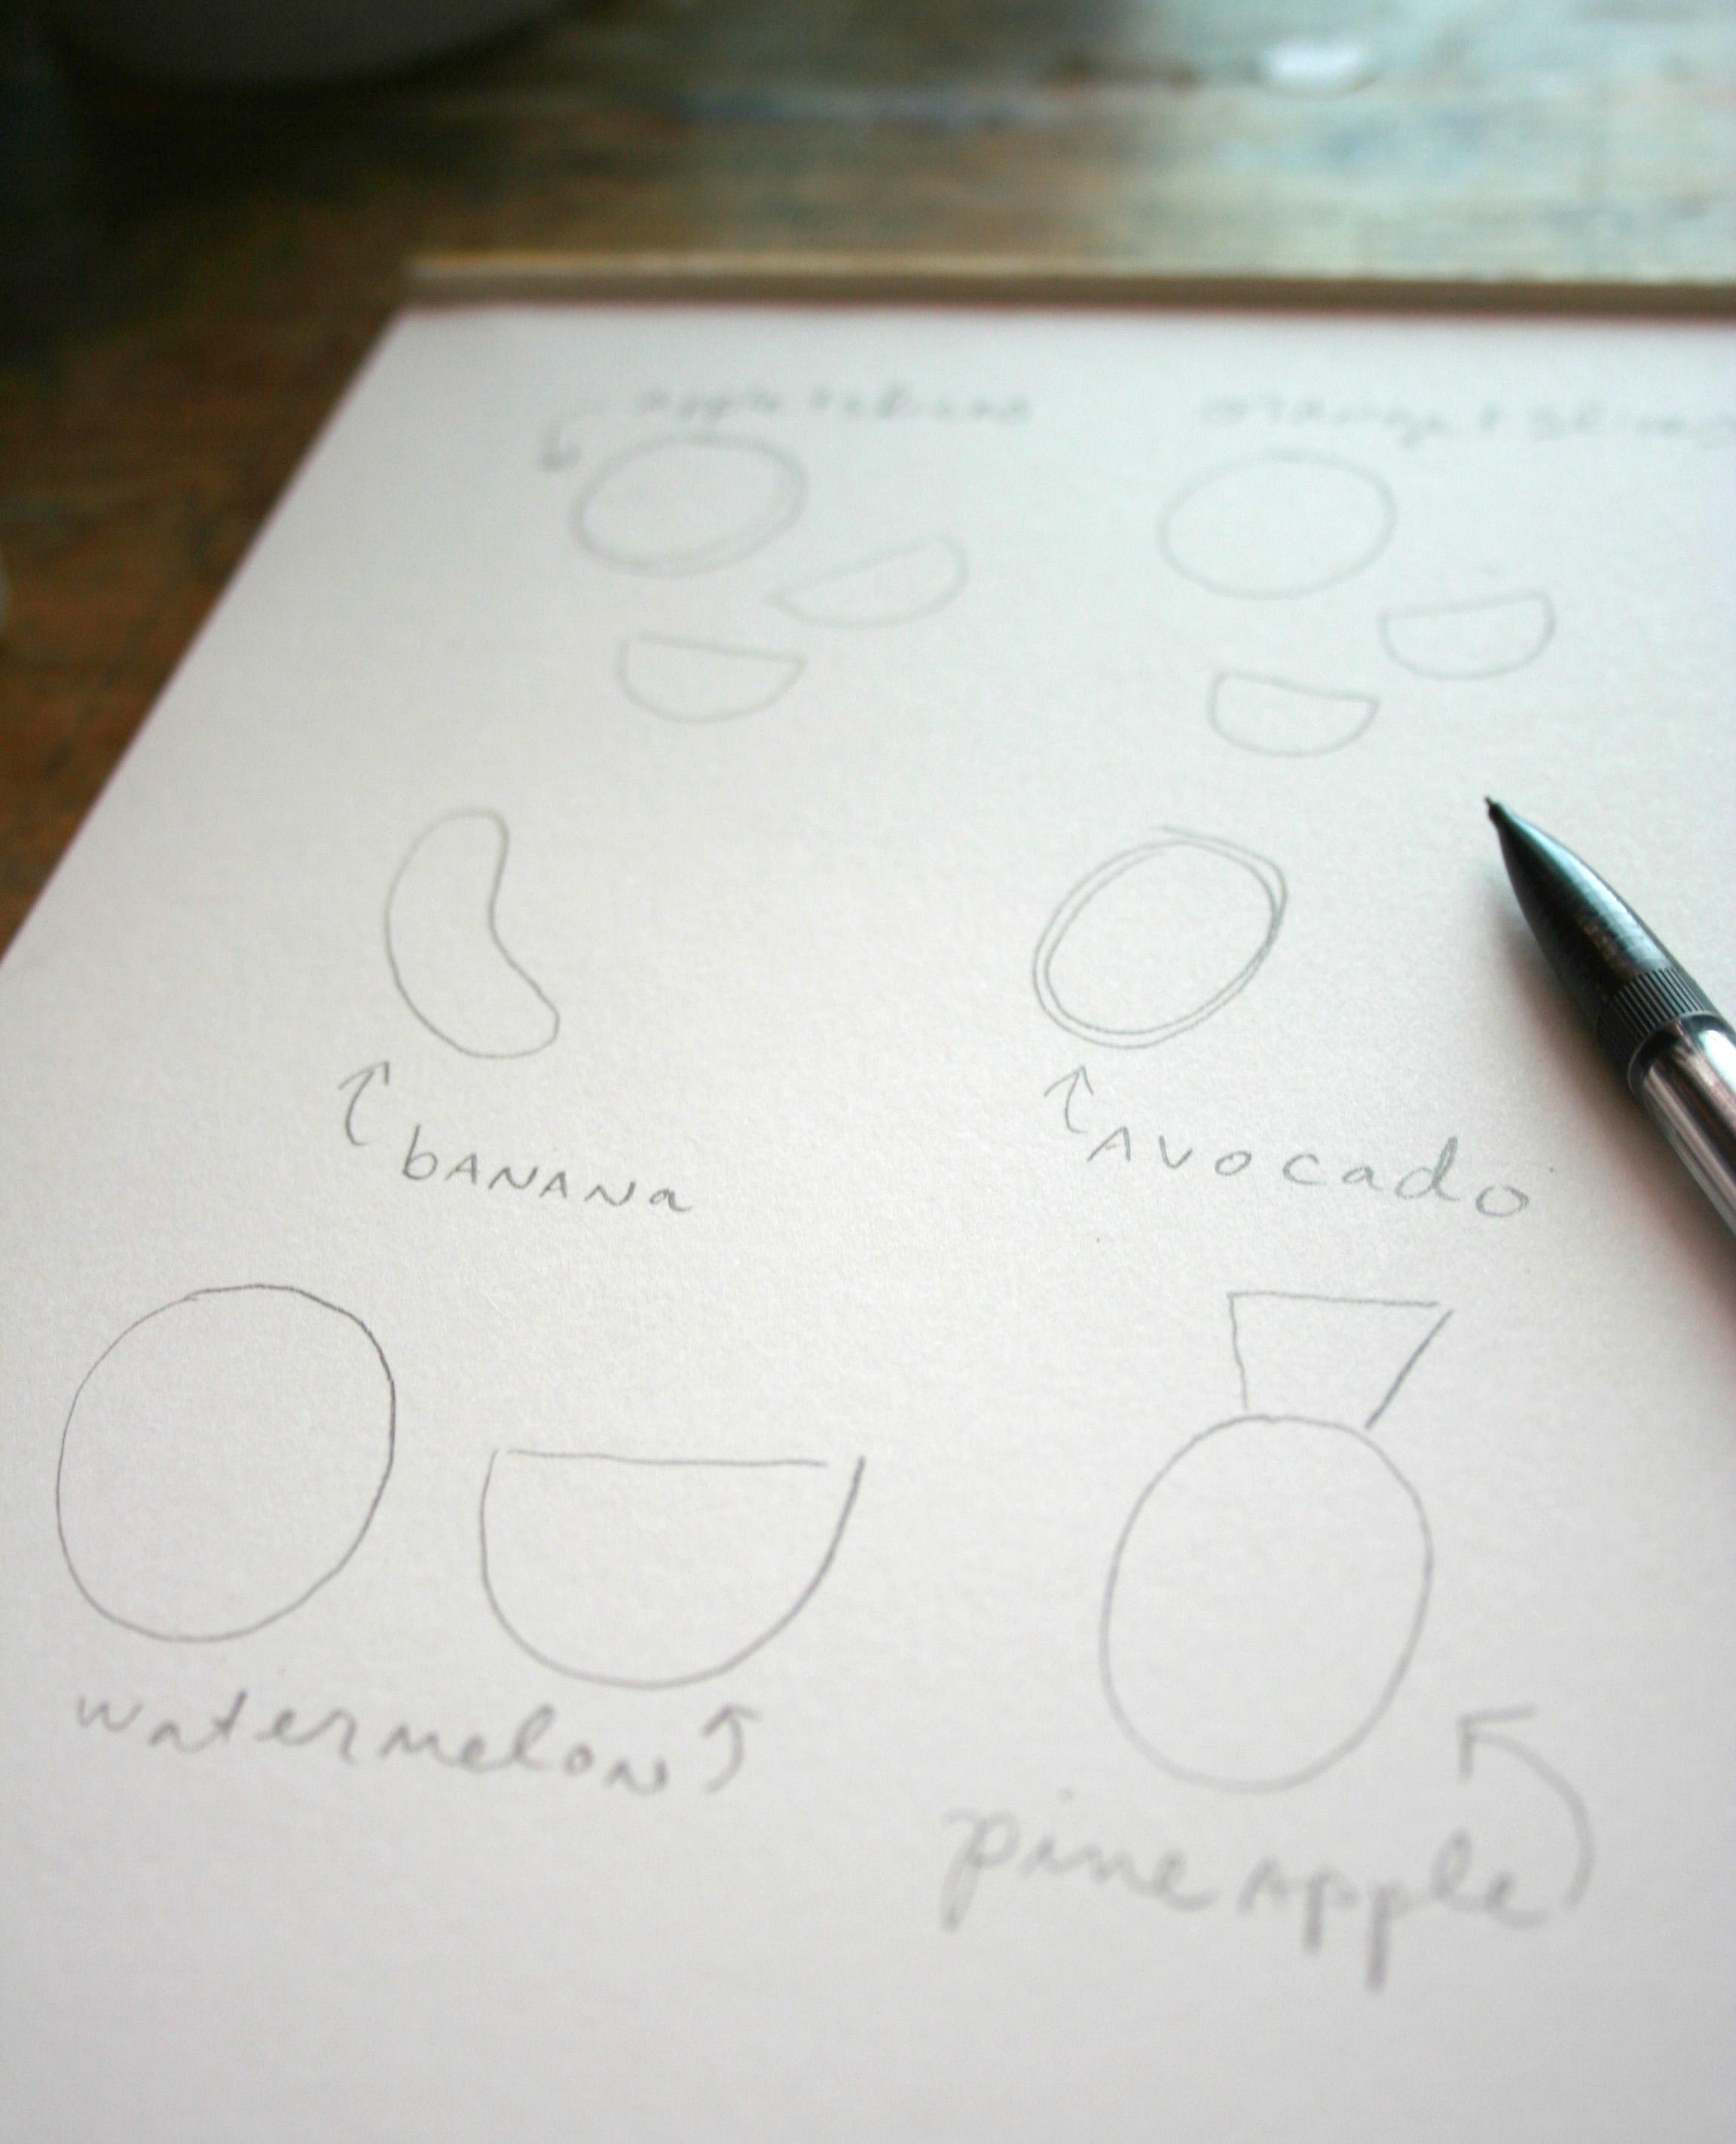 General shapes